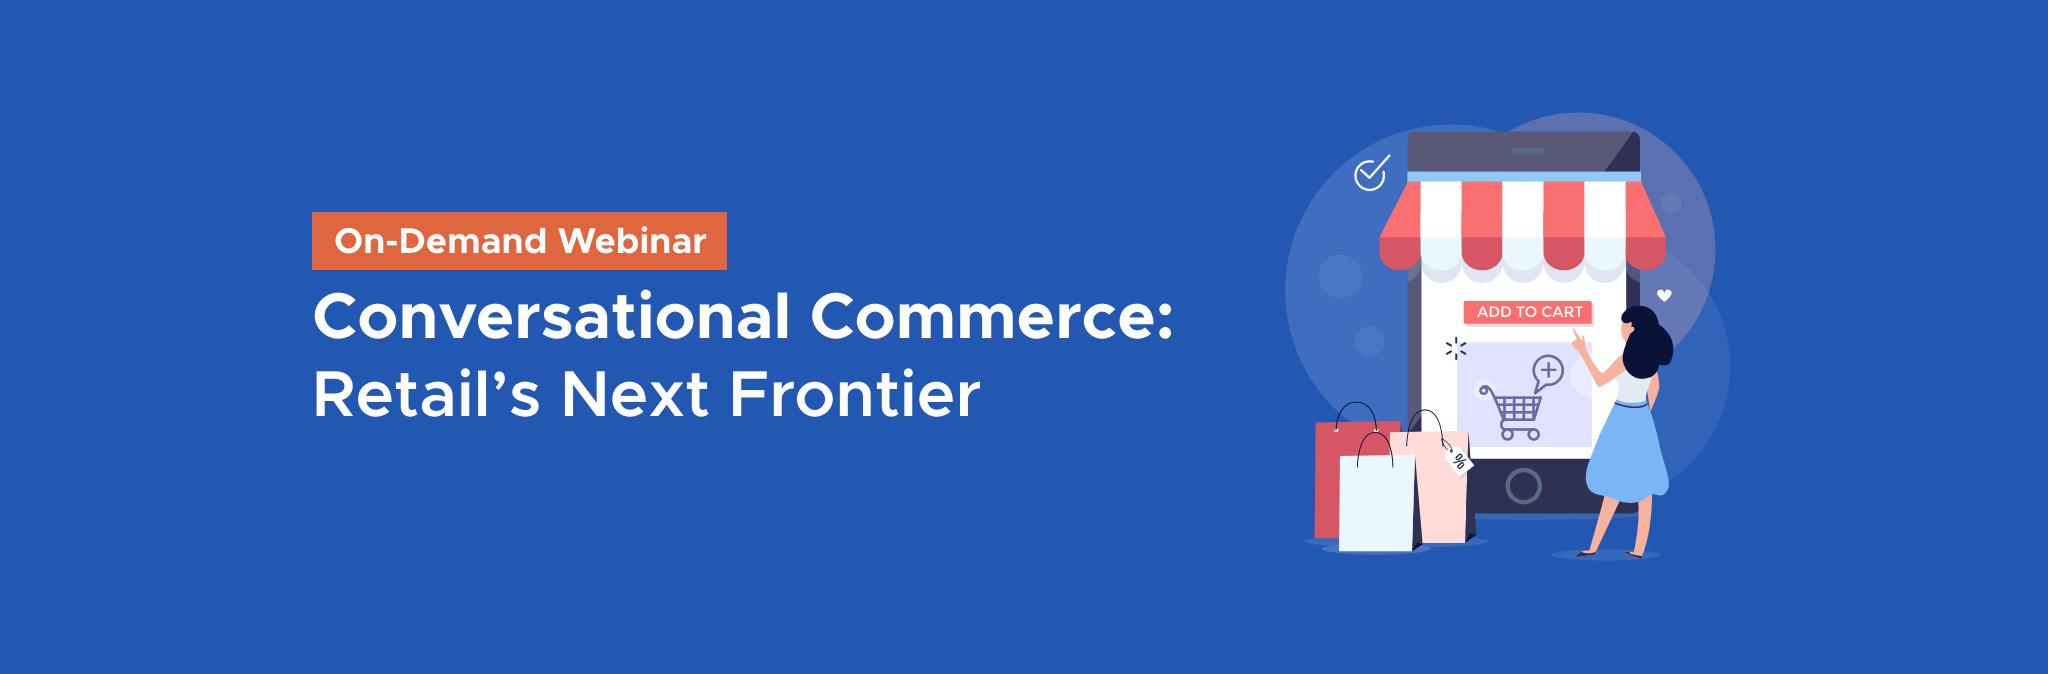 On-Demand Webinar: Conversational Commerce in Retail